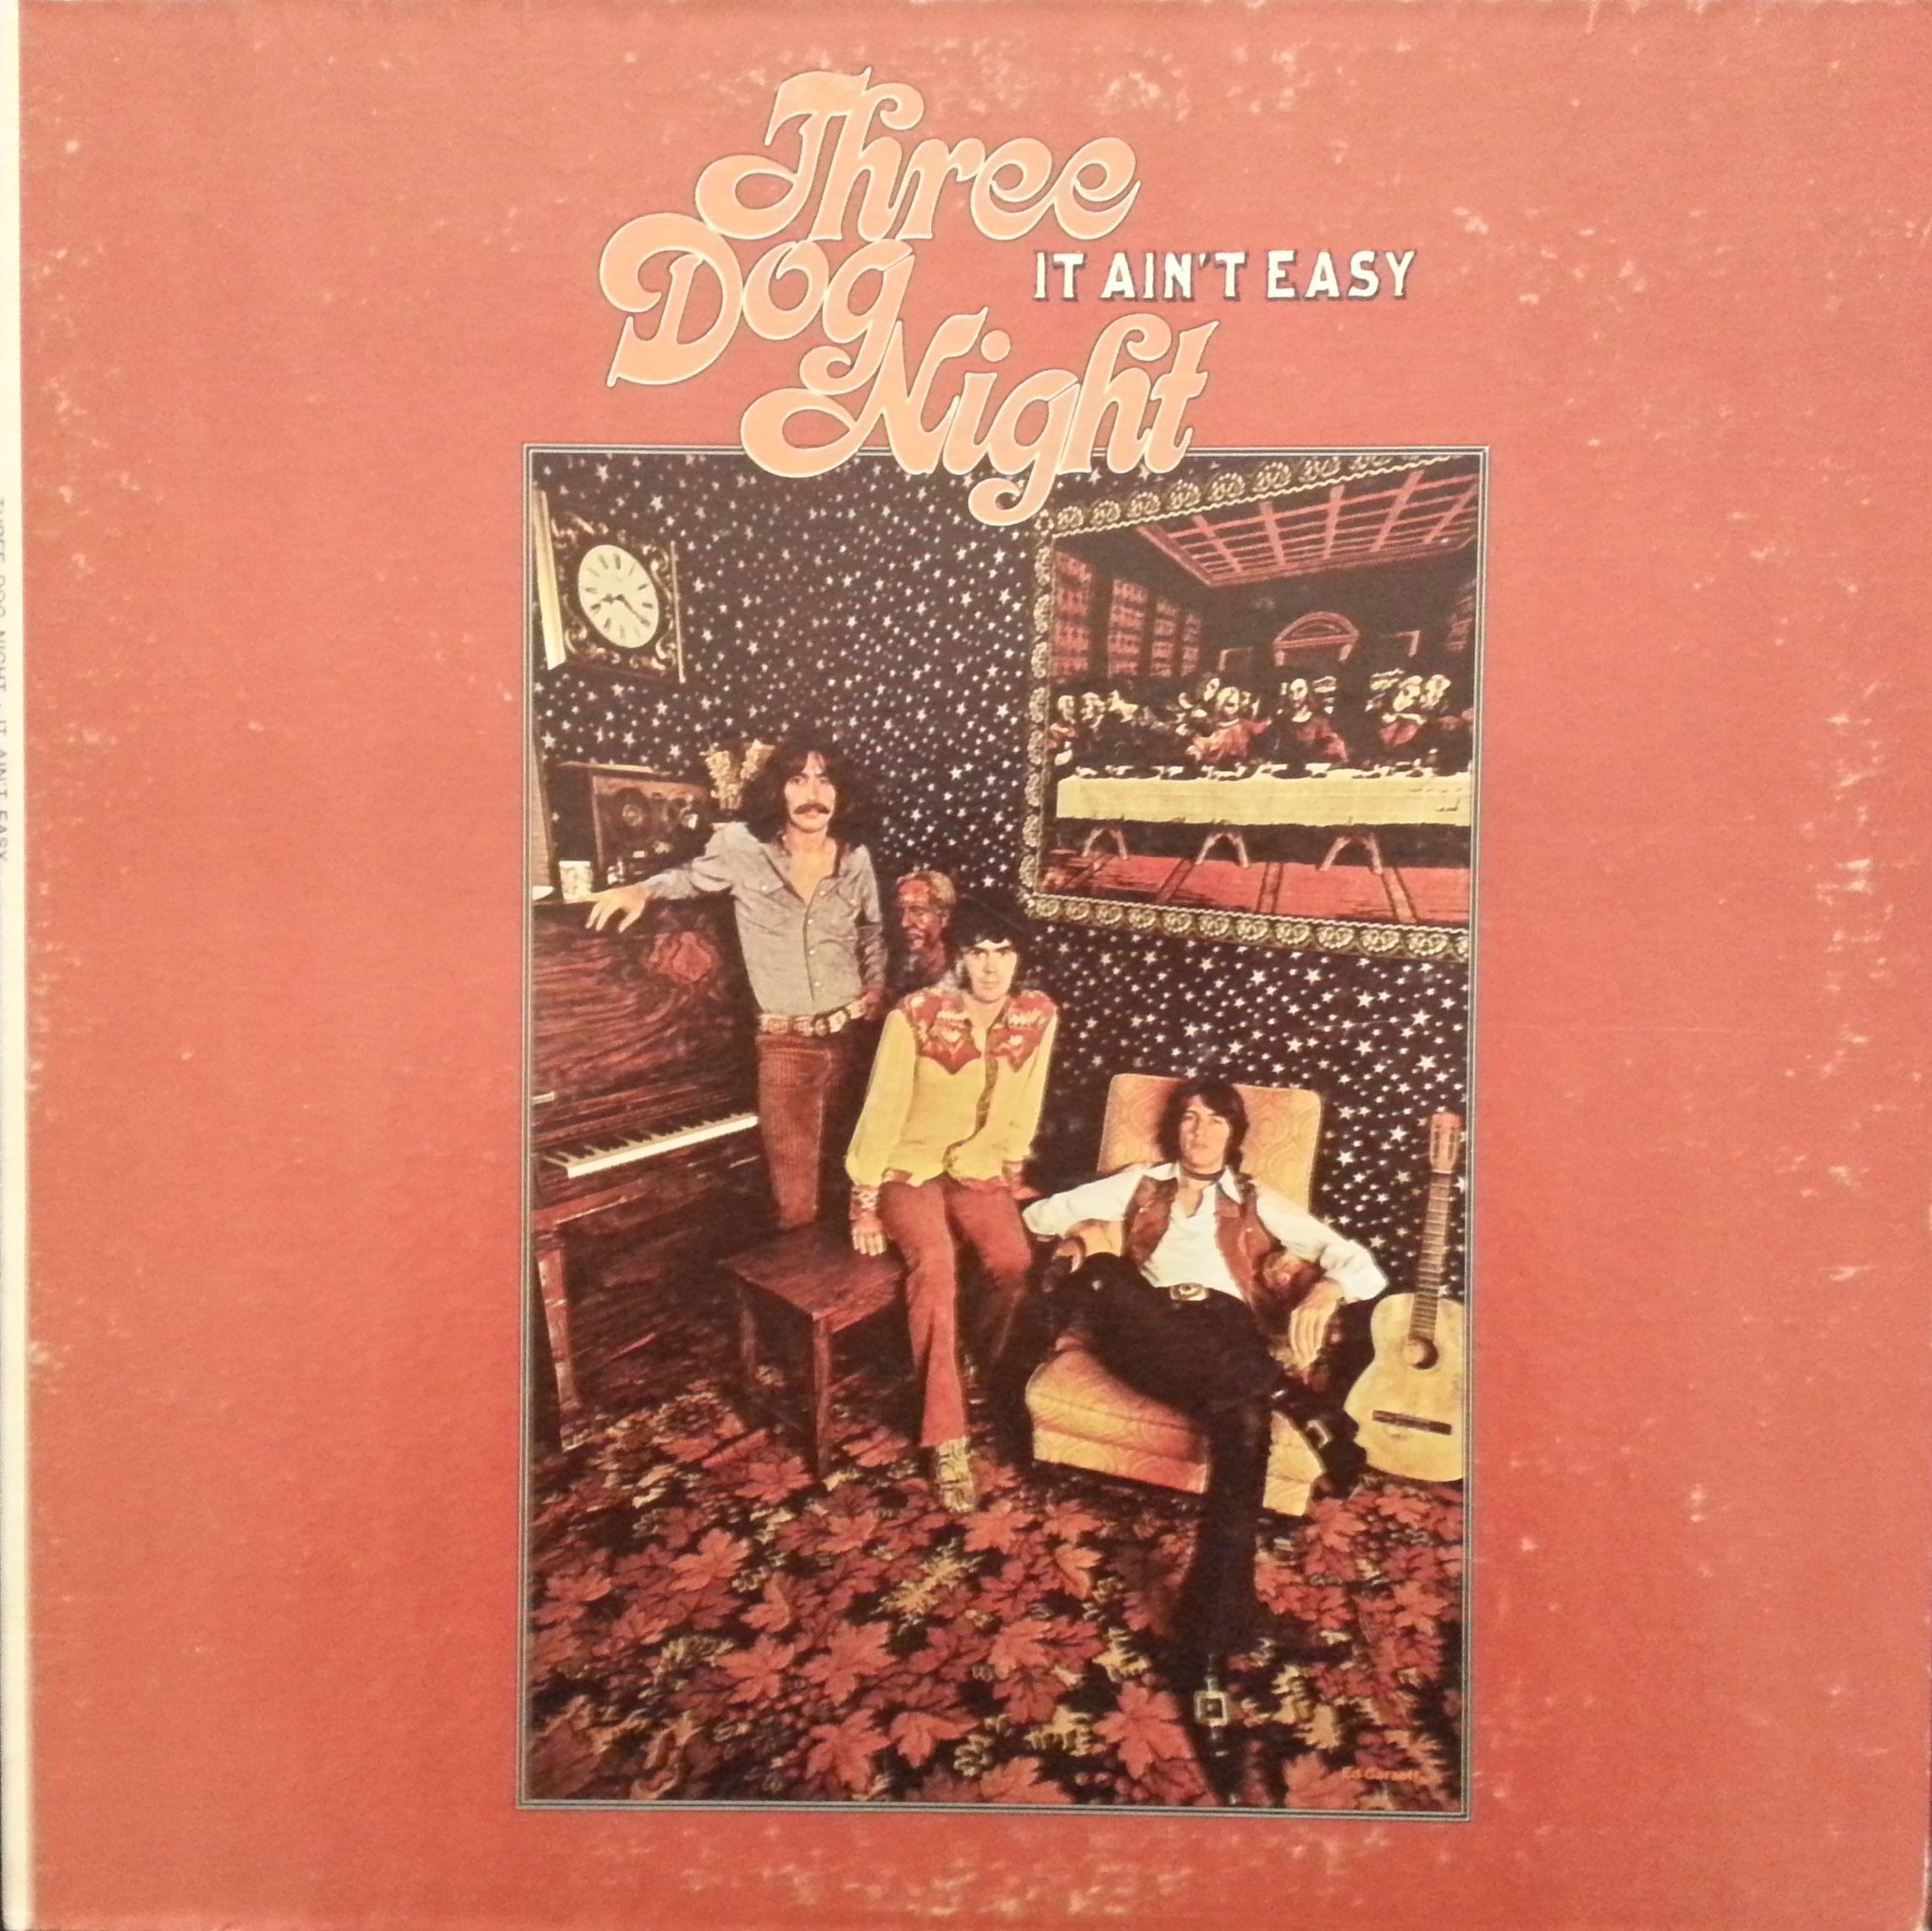 Three Dog Night It Ain T Easy March 31 1970 This Was Their Third Album I Saw Three Dog Night Perform At Thre Three Dog Night Album Cover Art Three Dogs